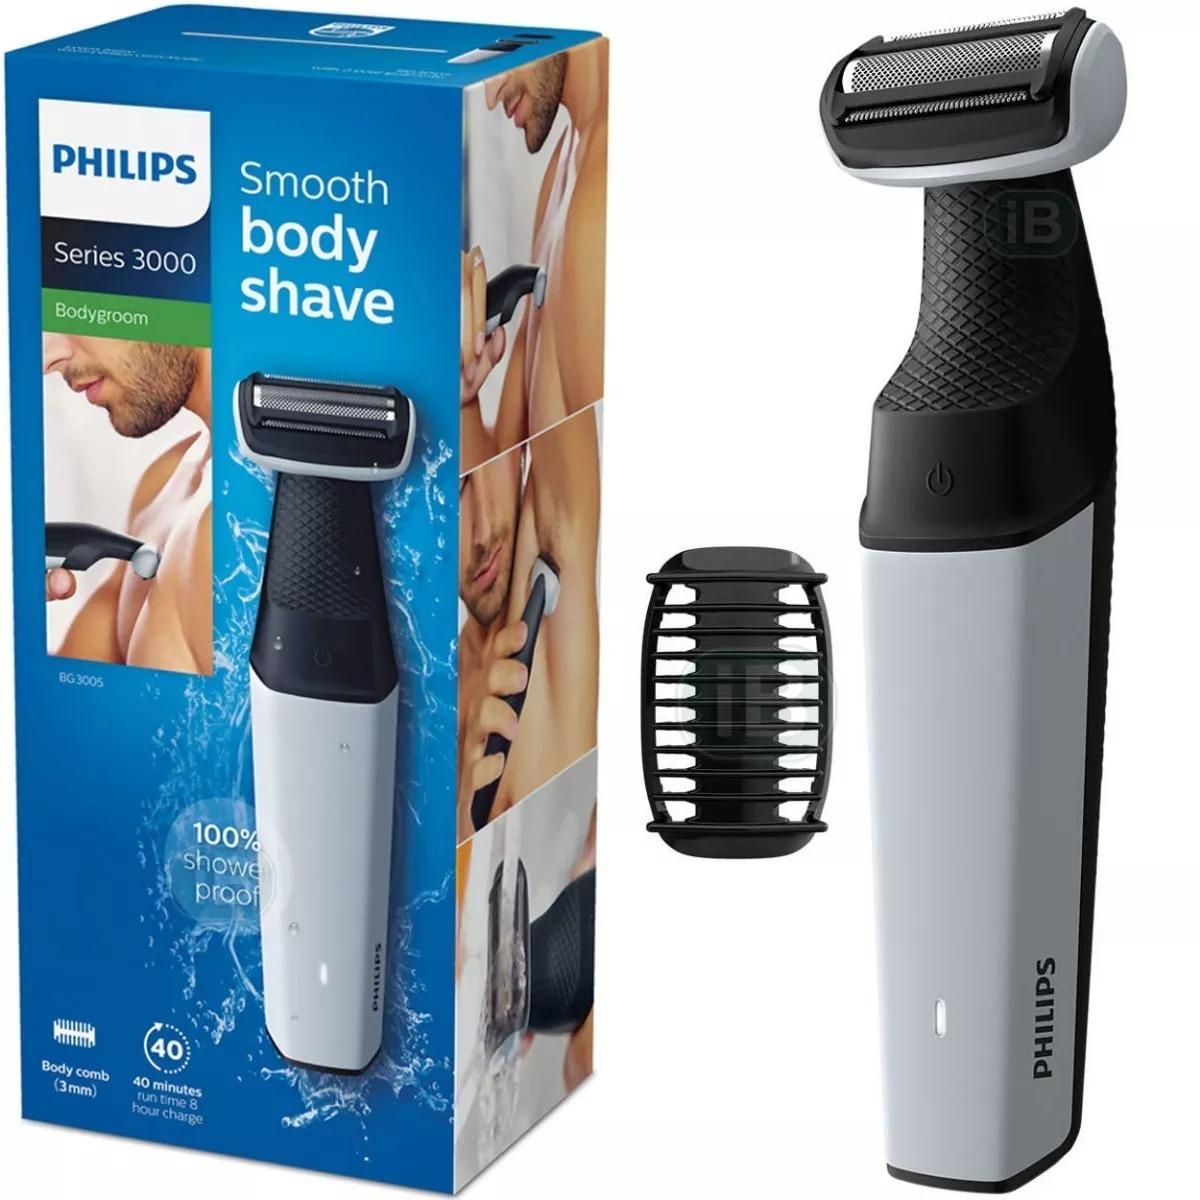 c511126c3 aparador e depilador elétrico pêlos masculino corpo philips. Carregando  zoom.